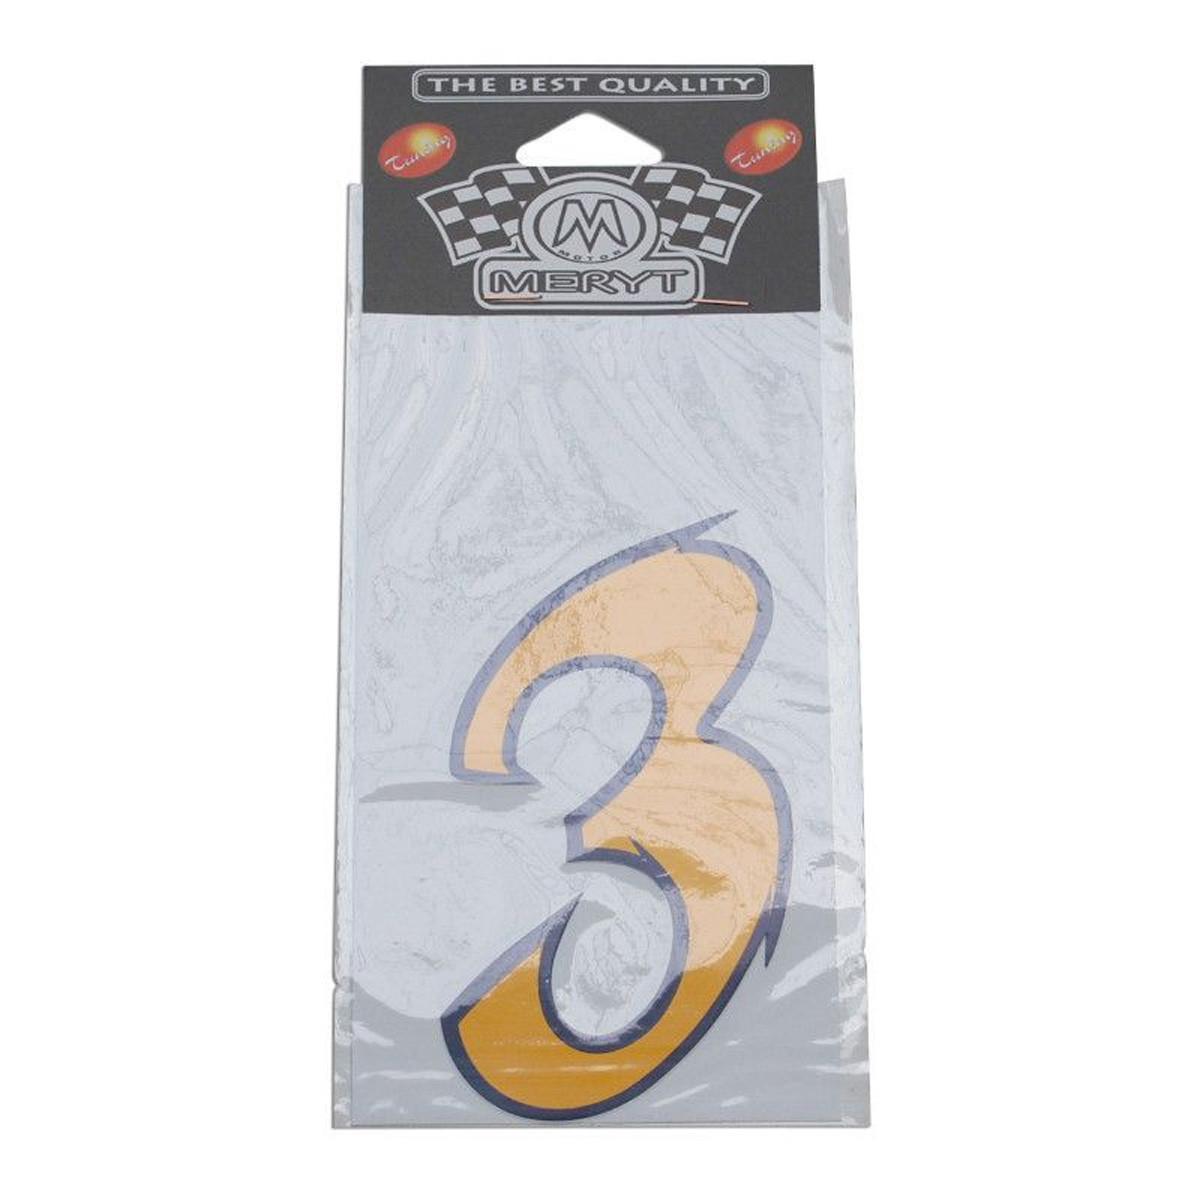 Autocollant / Sticker - MERYT Numéro 3 Jaune 9cm